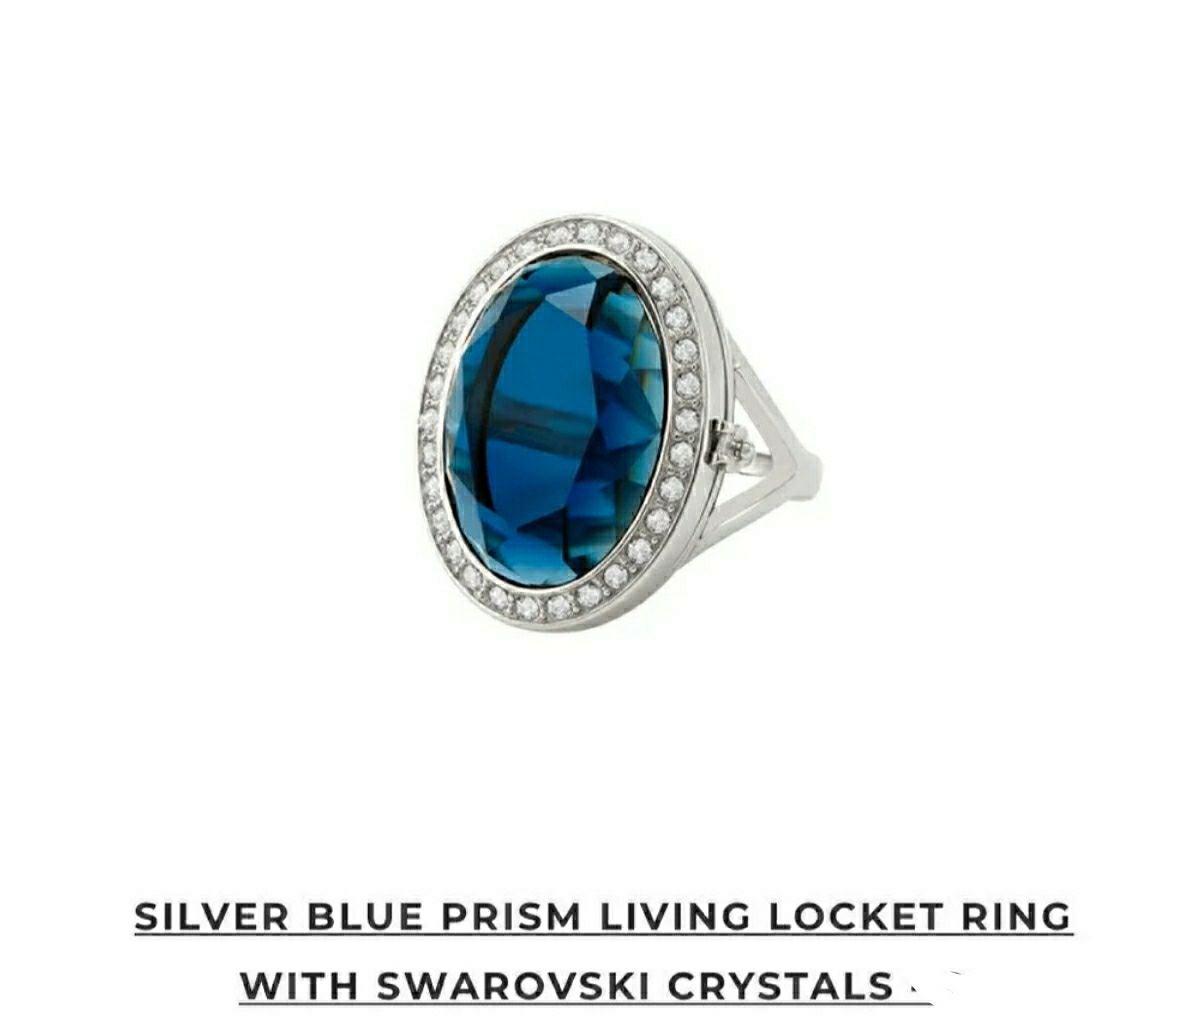 Silver Blue Prism Living Locket Ring